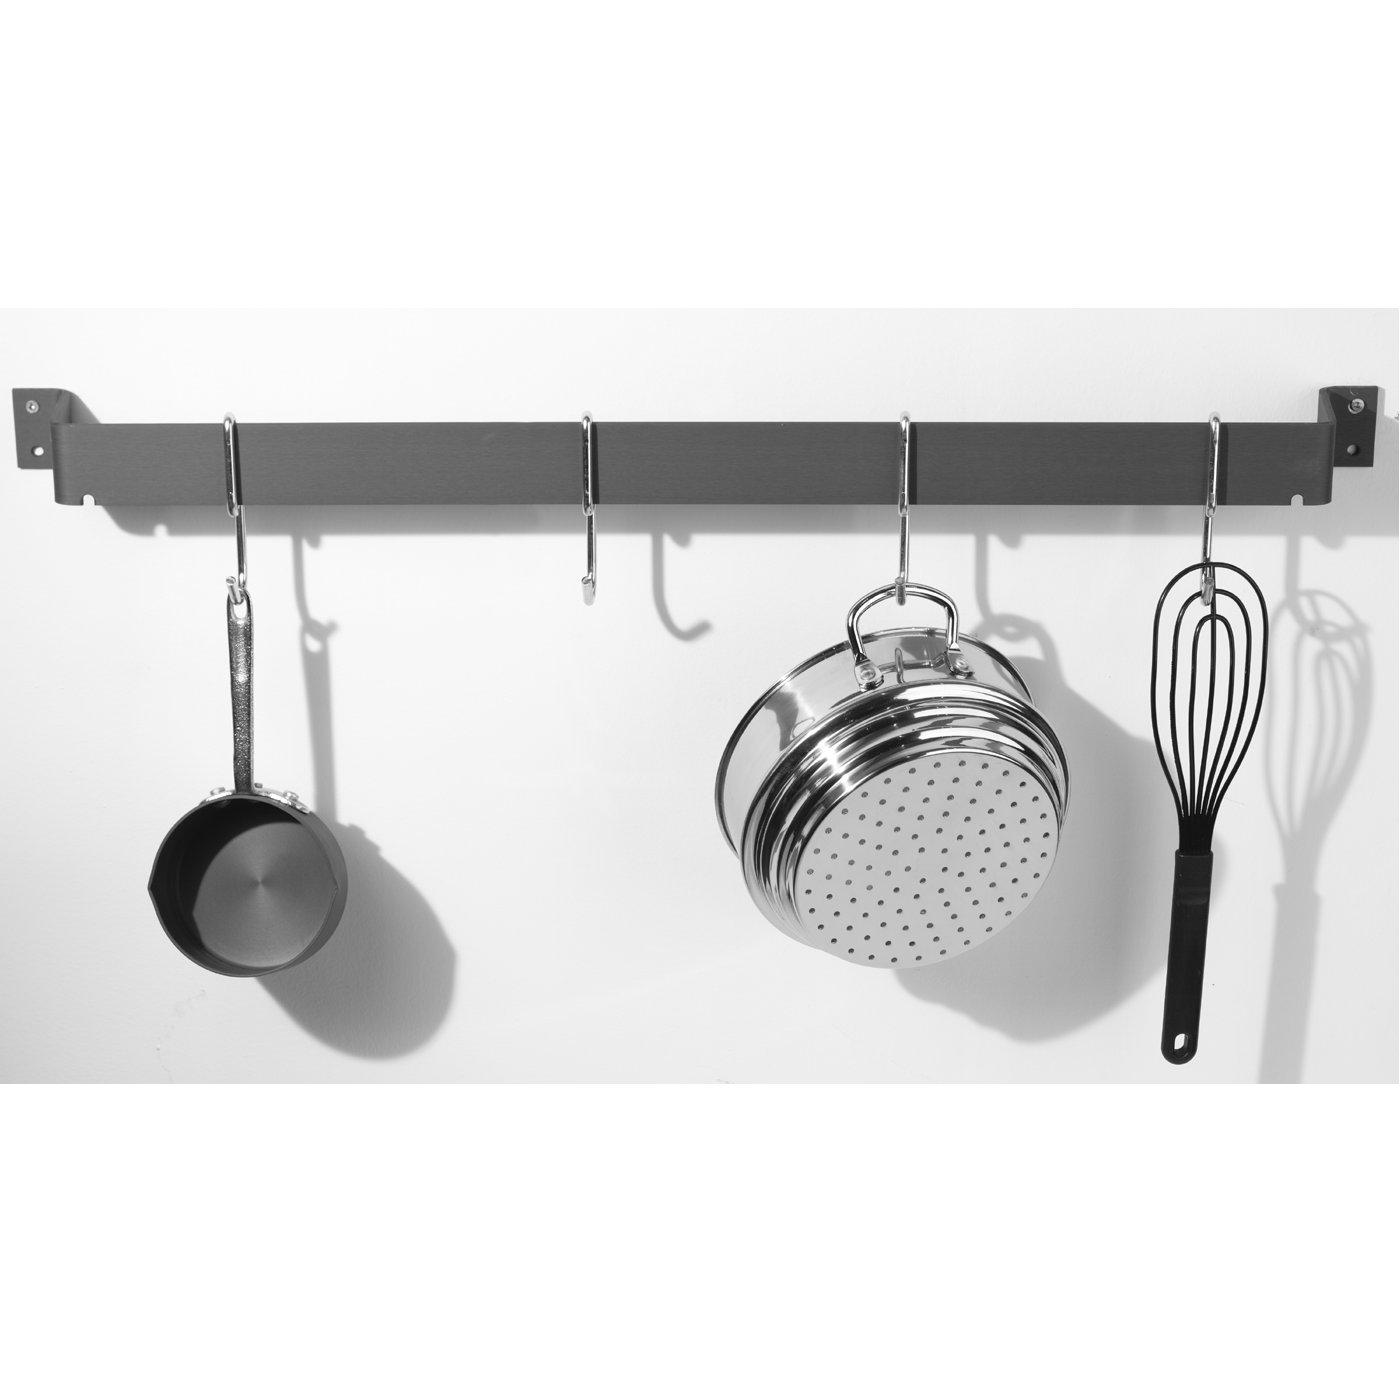 calphalon  straight wall pot rack hardanodized - add instant storage to your kitchen the calphalon hardanodized pot rack